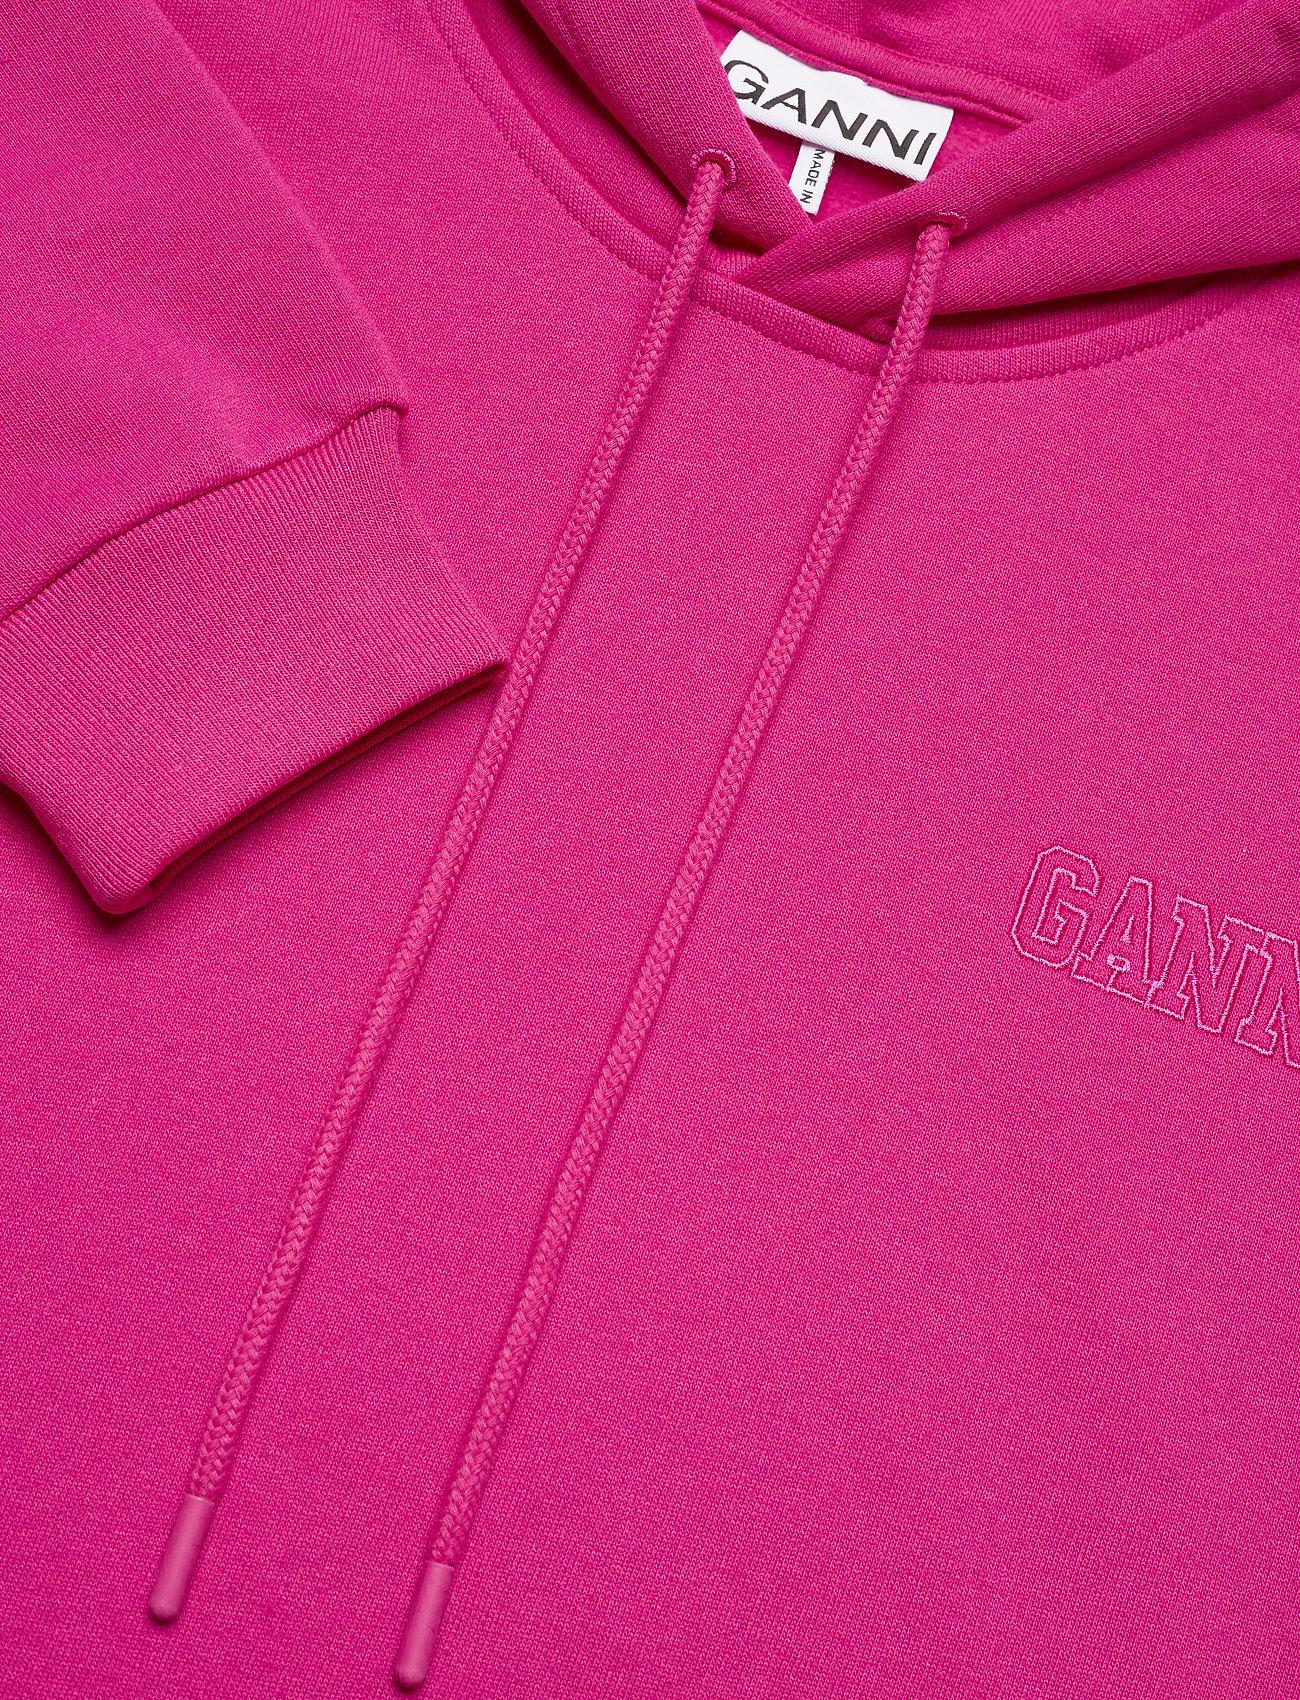 Ganni - Software Isoli - sweatshirts & hoodies - shocking pink - 4